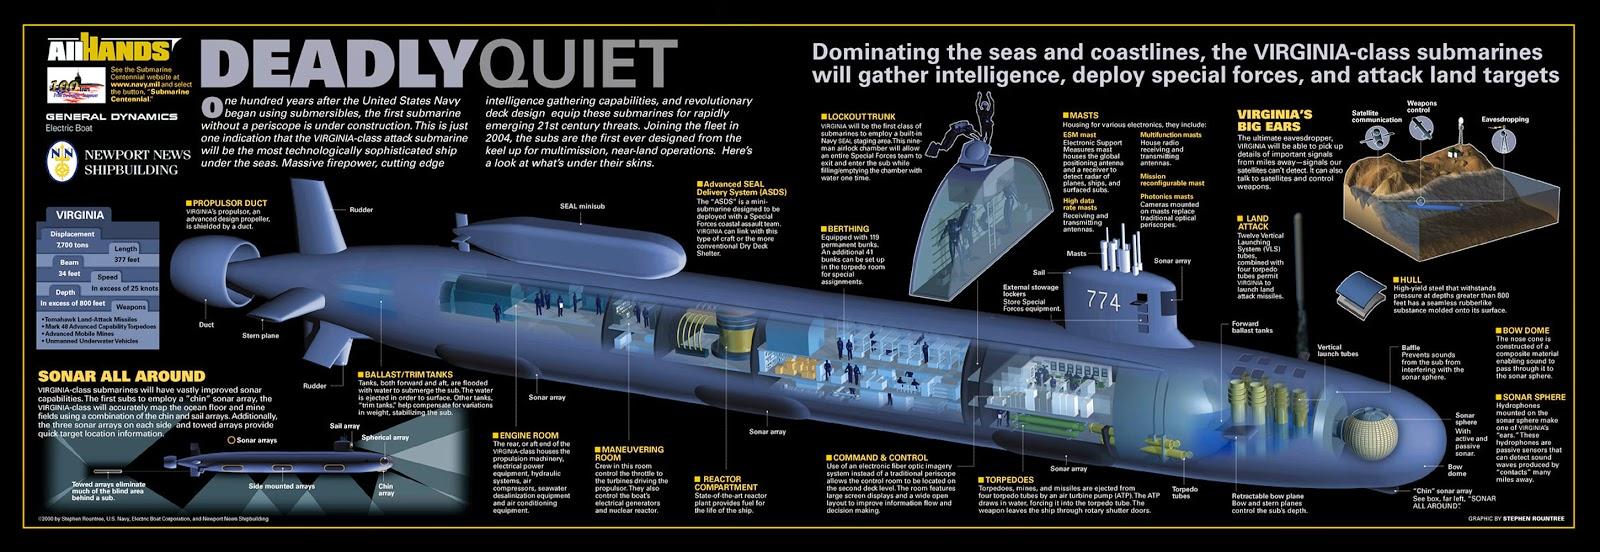 US Nuclear Submarine Force Virginiacutaway